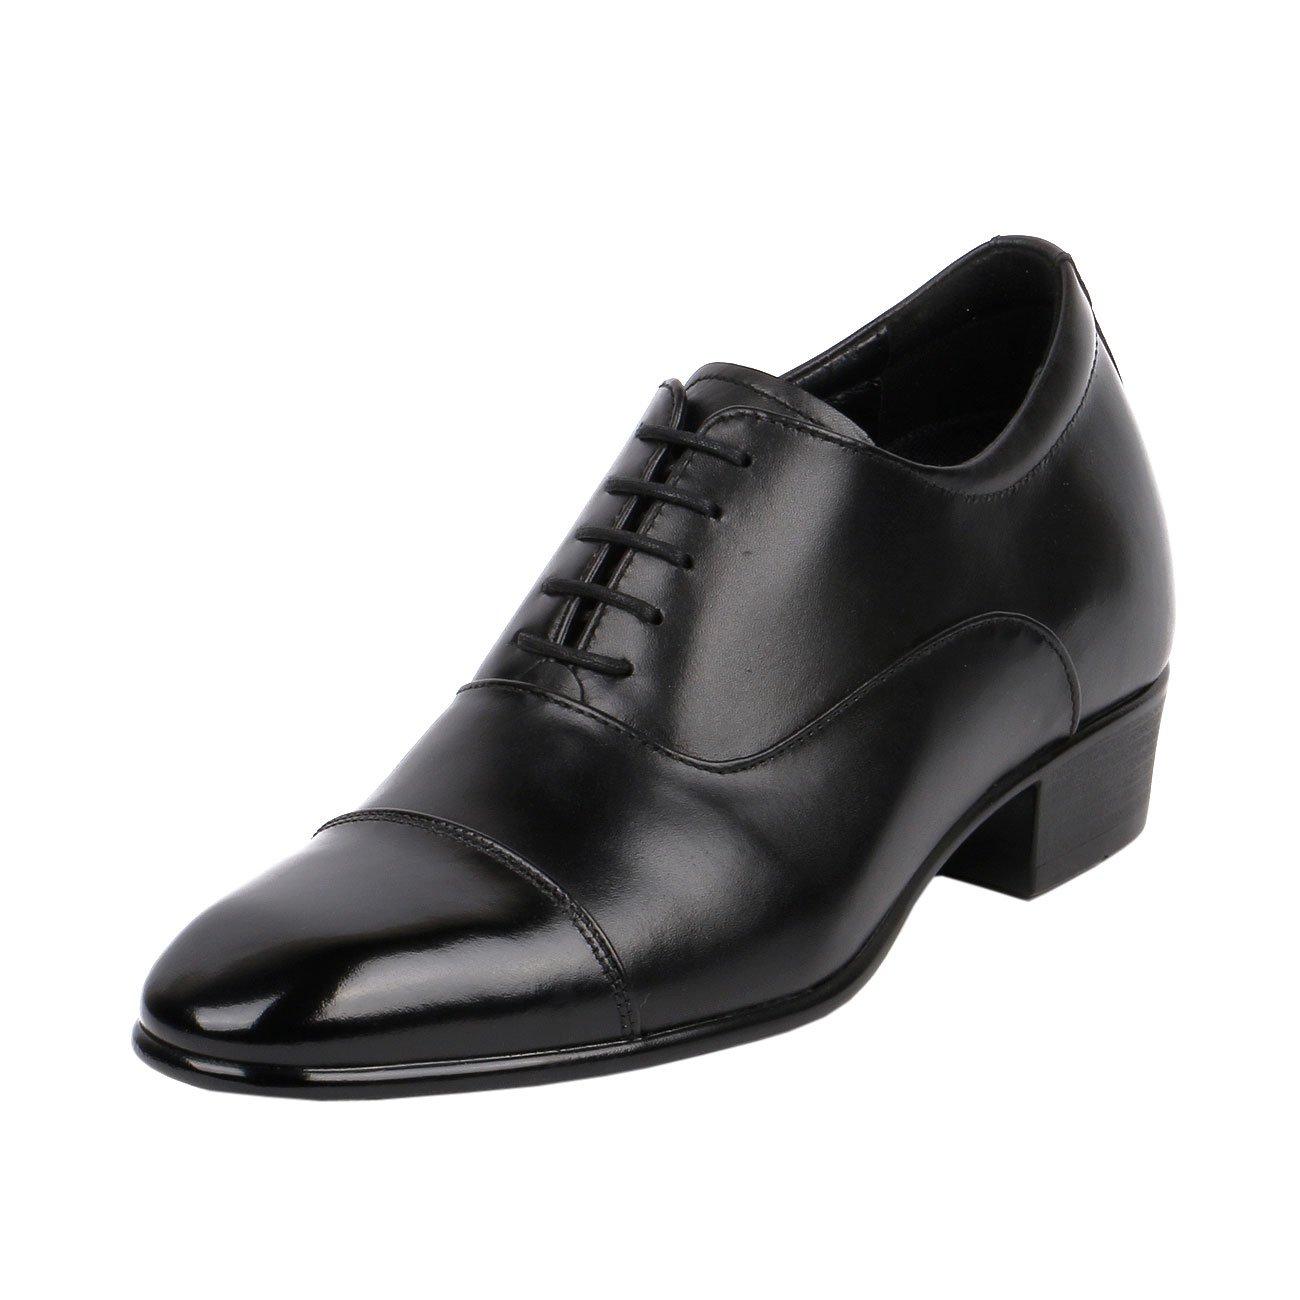 55ba565c954 Amazon.com | Men High Heel Dress Shoes 3 Inch Height Taller Leather Black  Cap Toe-JW503 | Walking